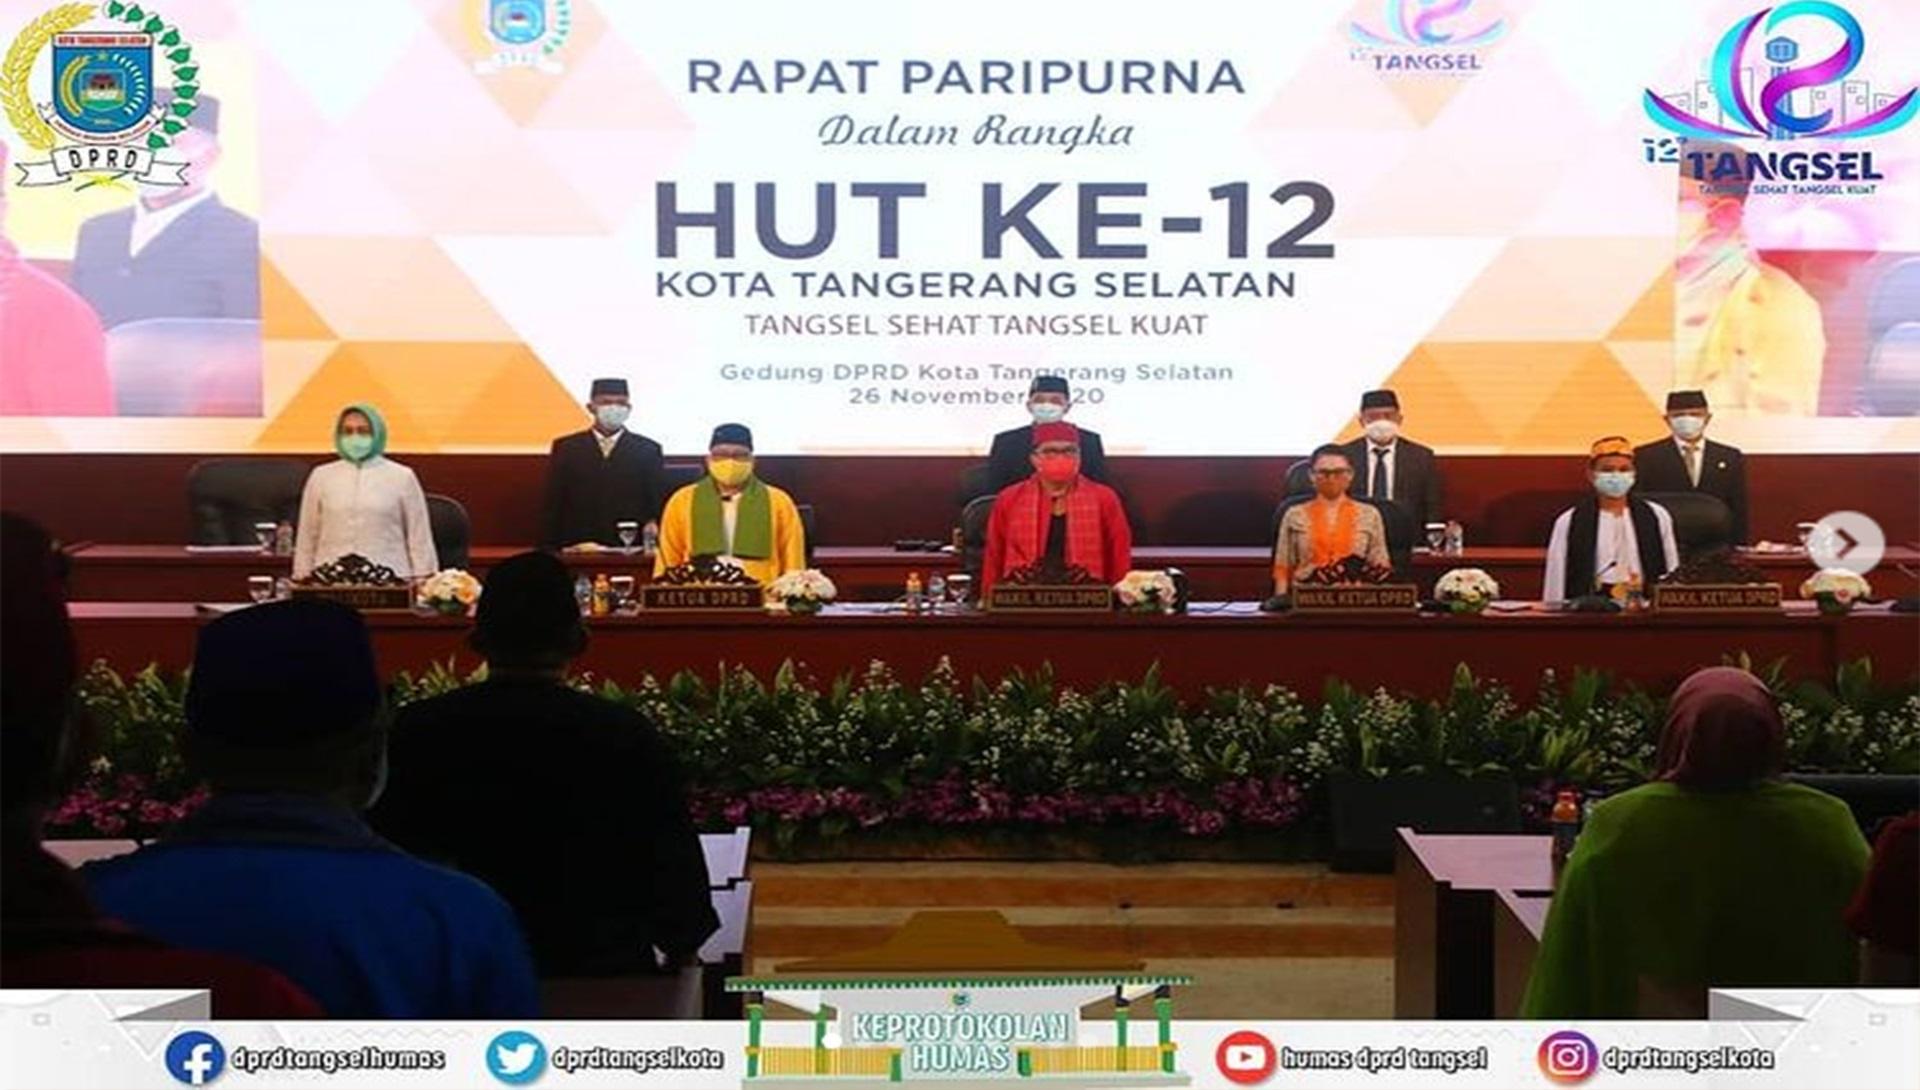 Sidang Paripurna Memperingati Hari jadi ke-12 Kota Tangerang Selatan